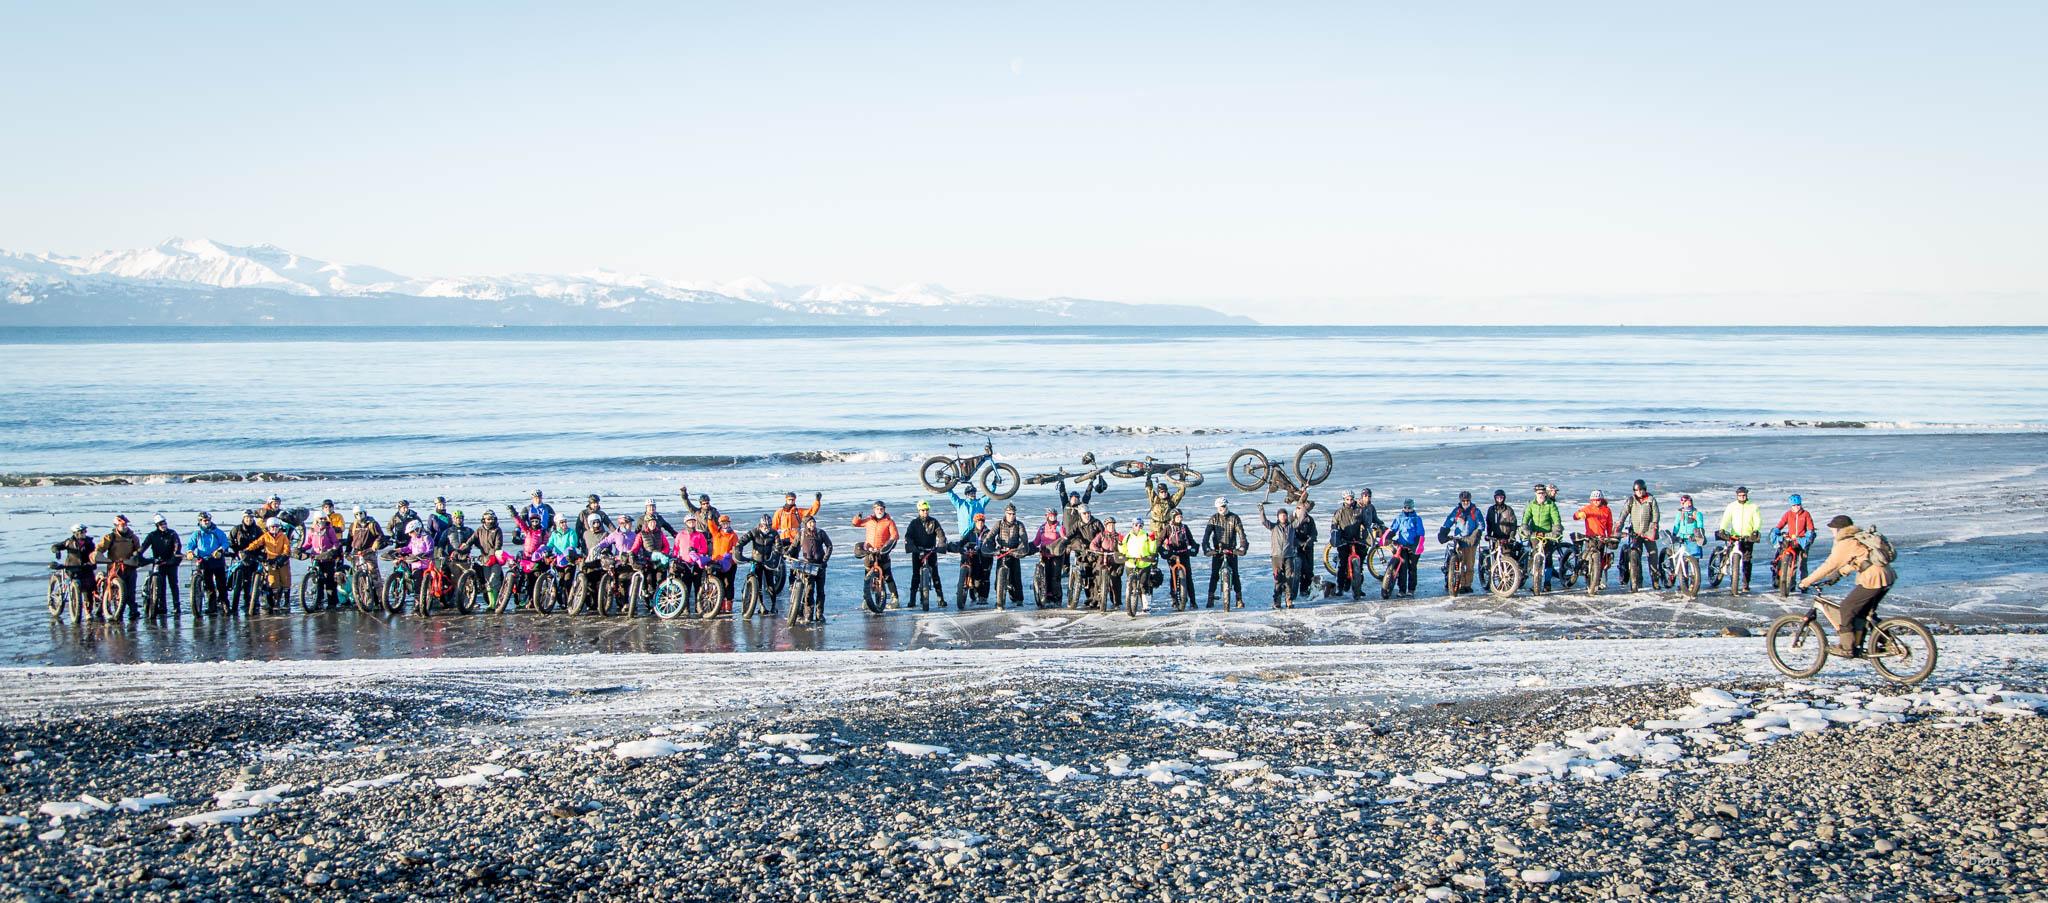 Homer Cycling Club's Big Fat Bike Festival - Homer, Alaska.